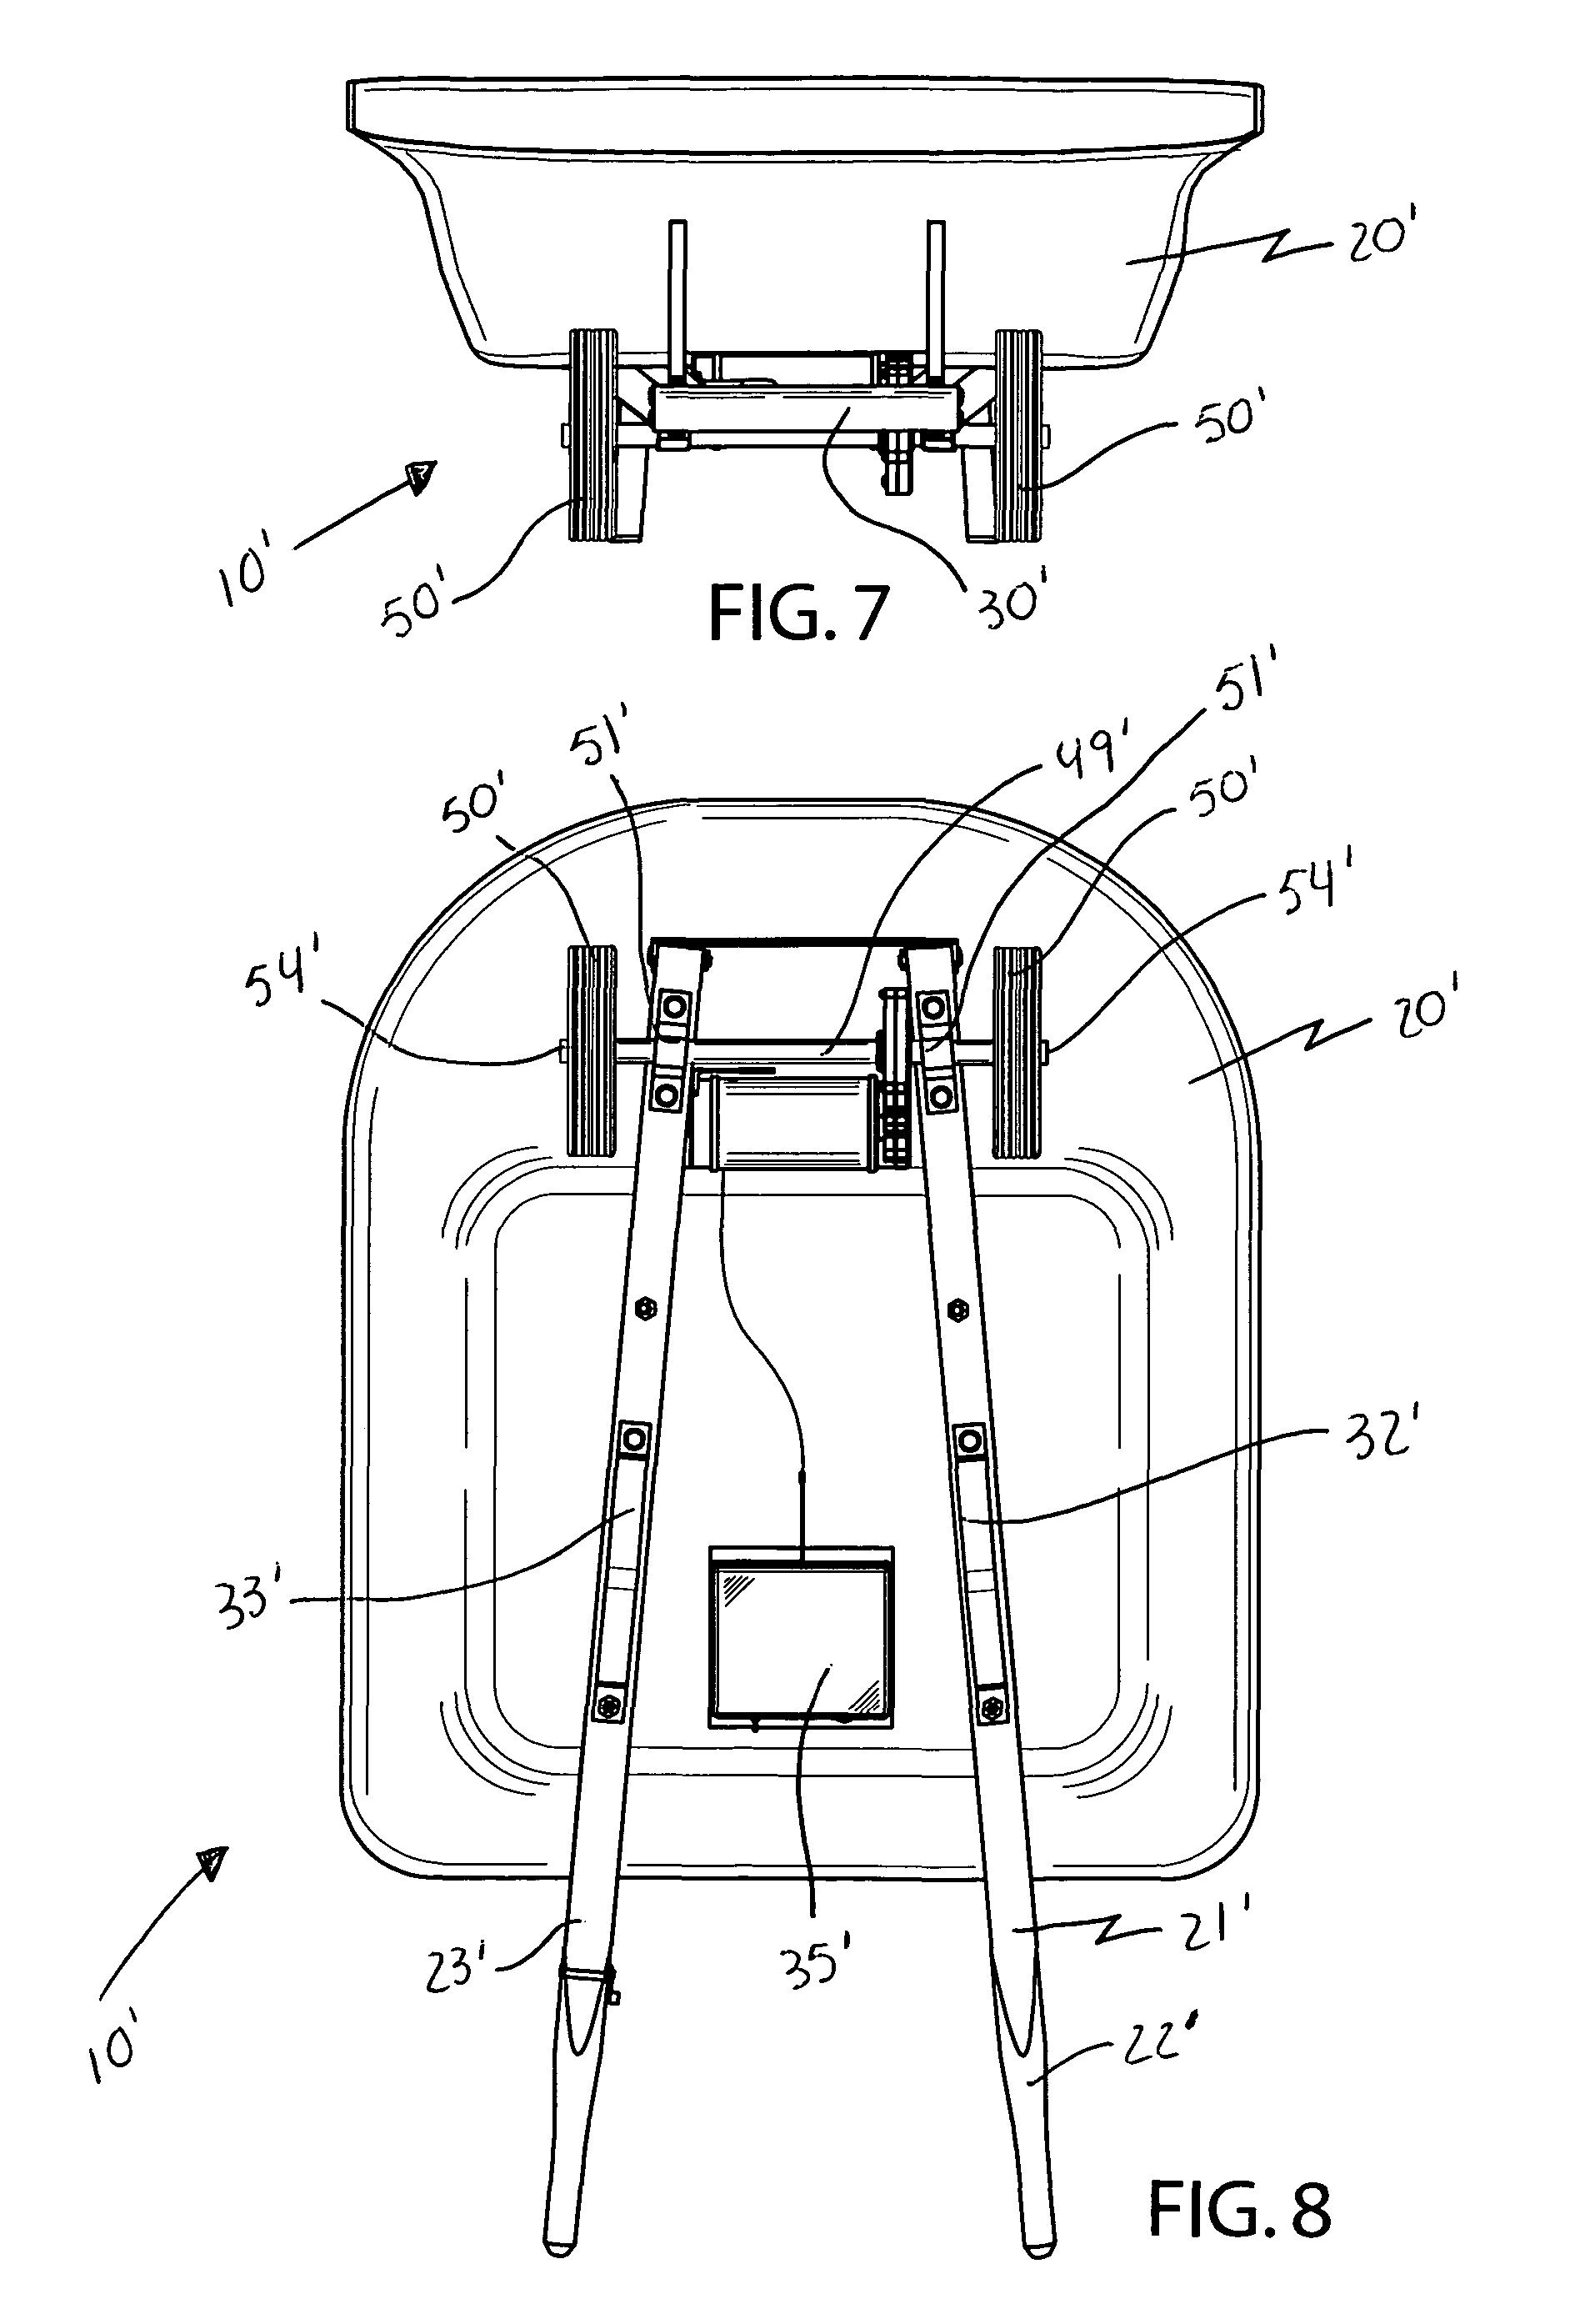 Electric Wheelbarrow Wiring Diagram Nissan Sentra Ignition